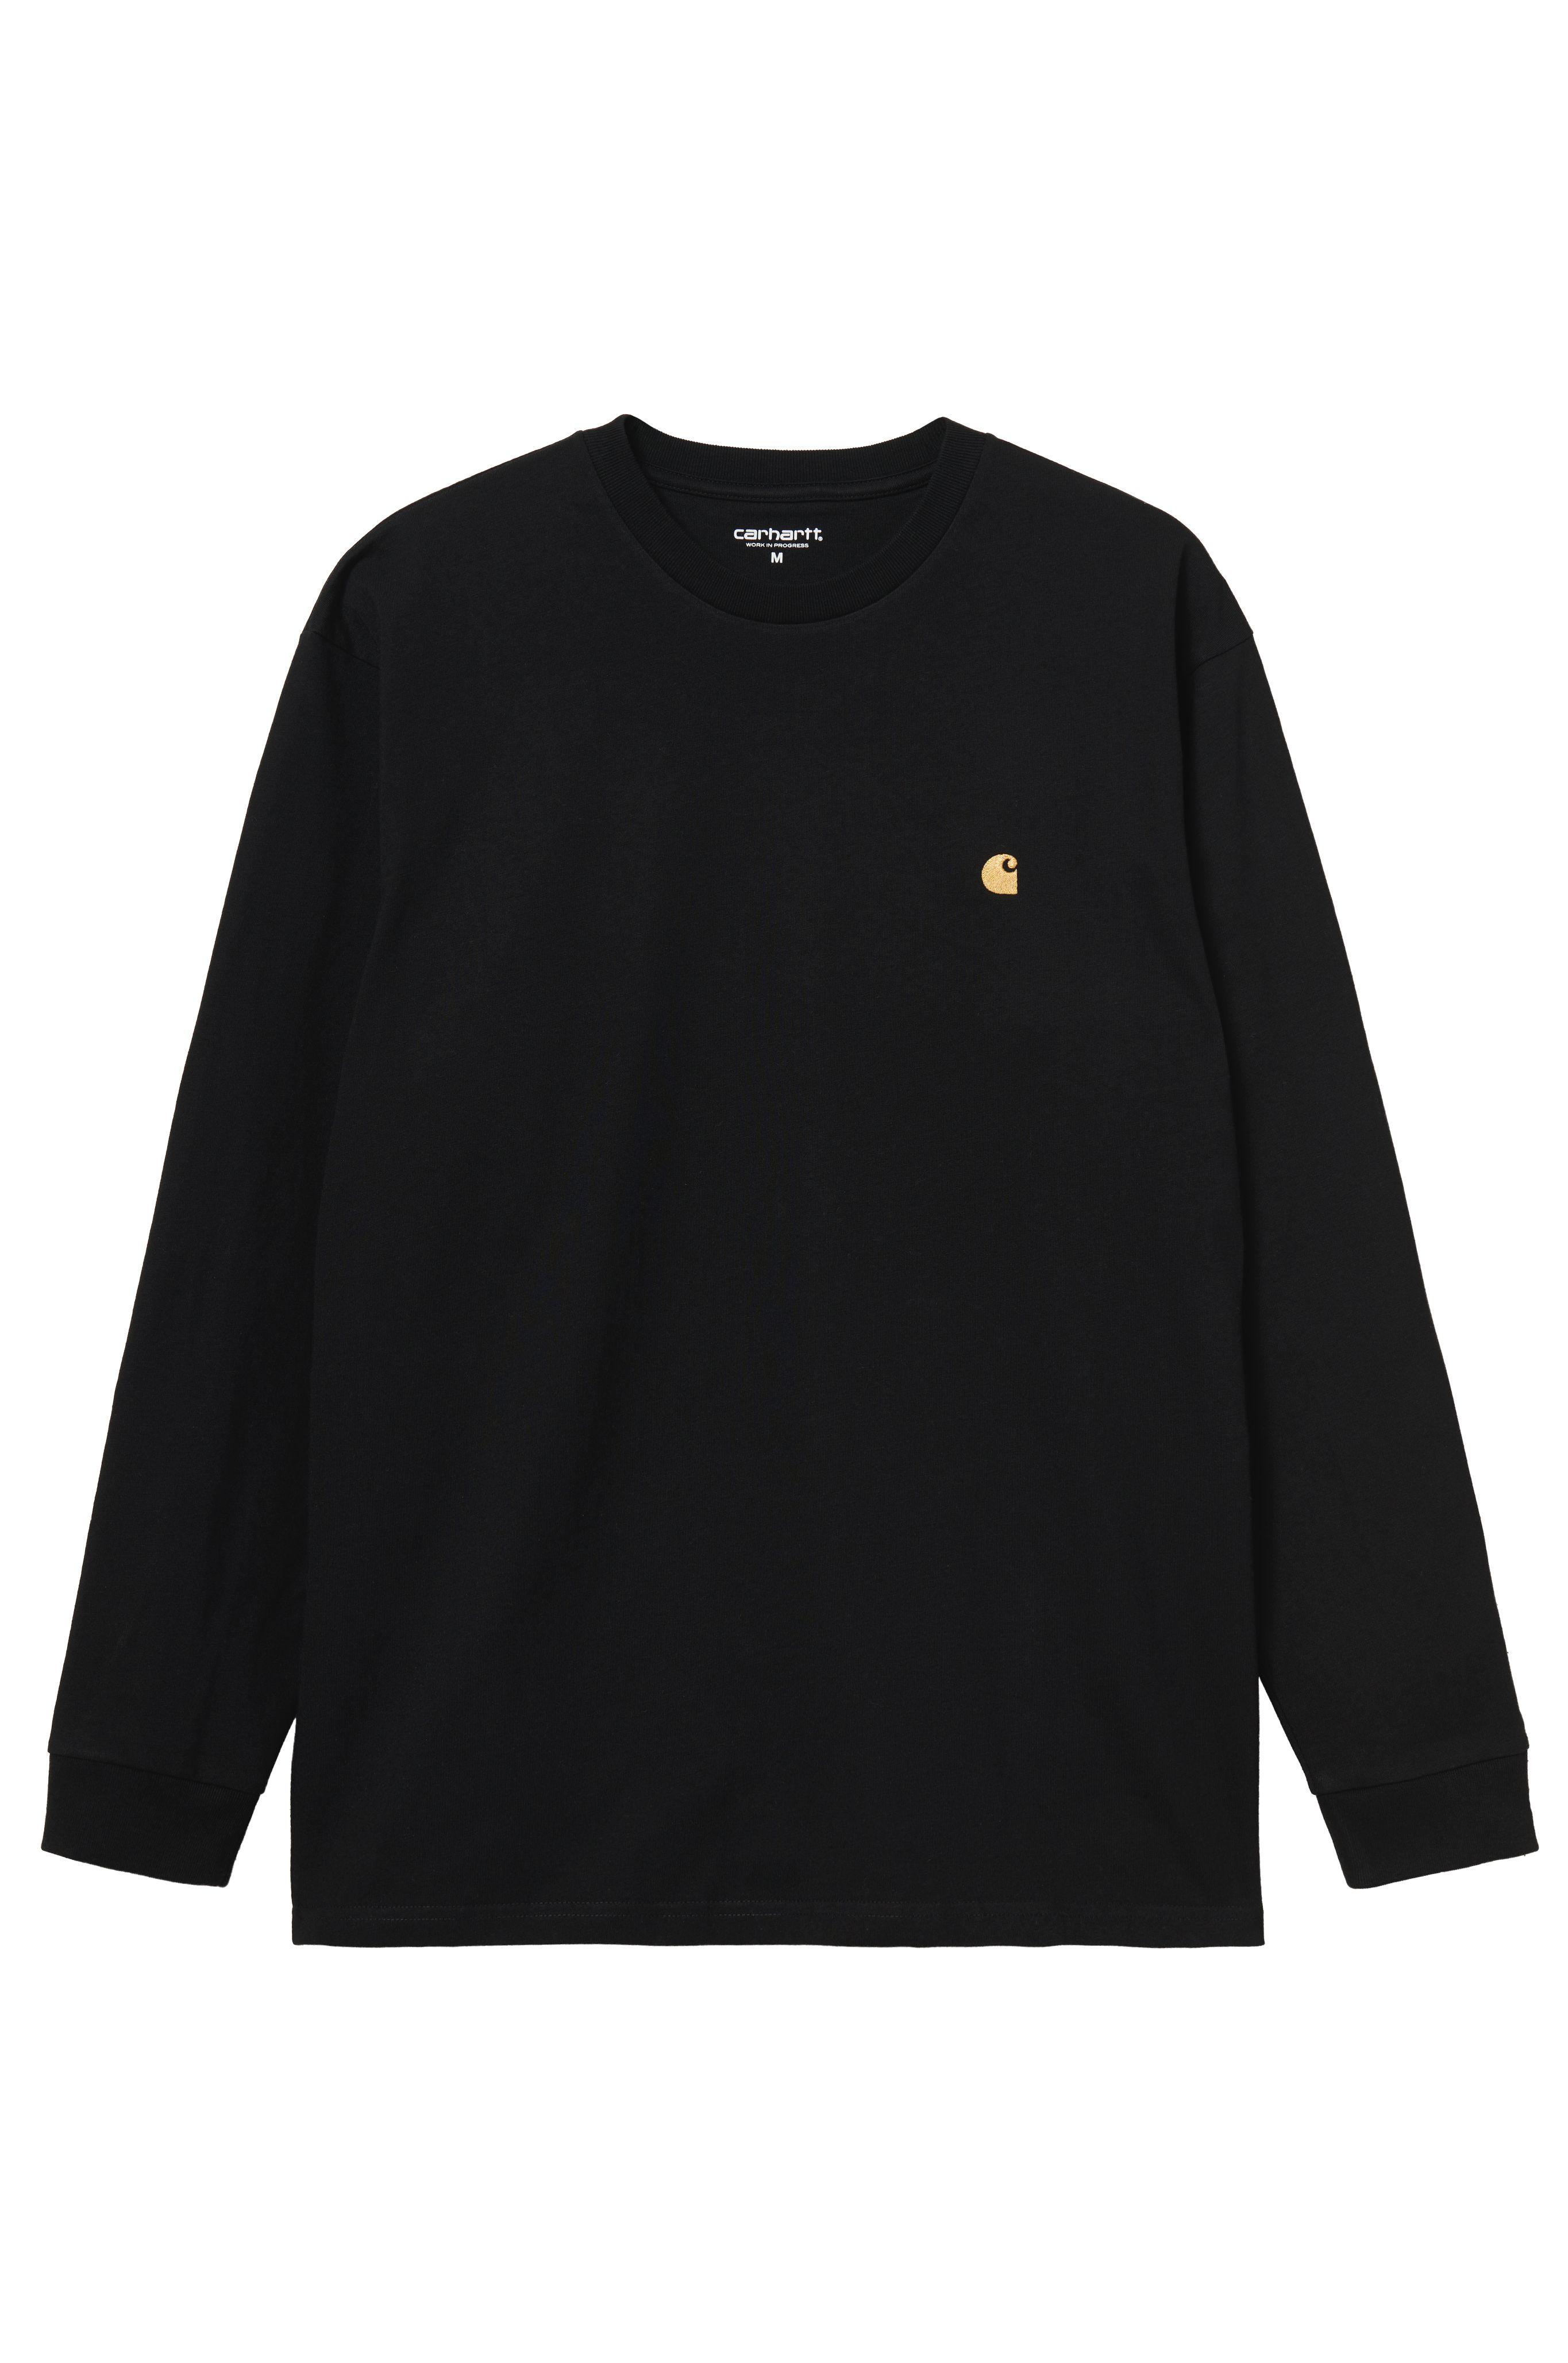 Carhartt WIP L-Sleeve CHASE Black/Gold